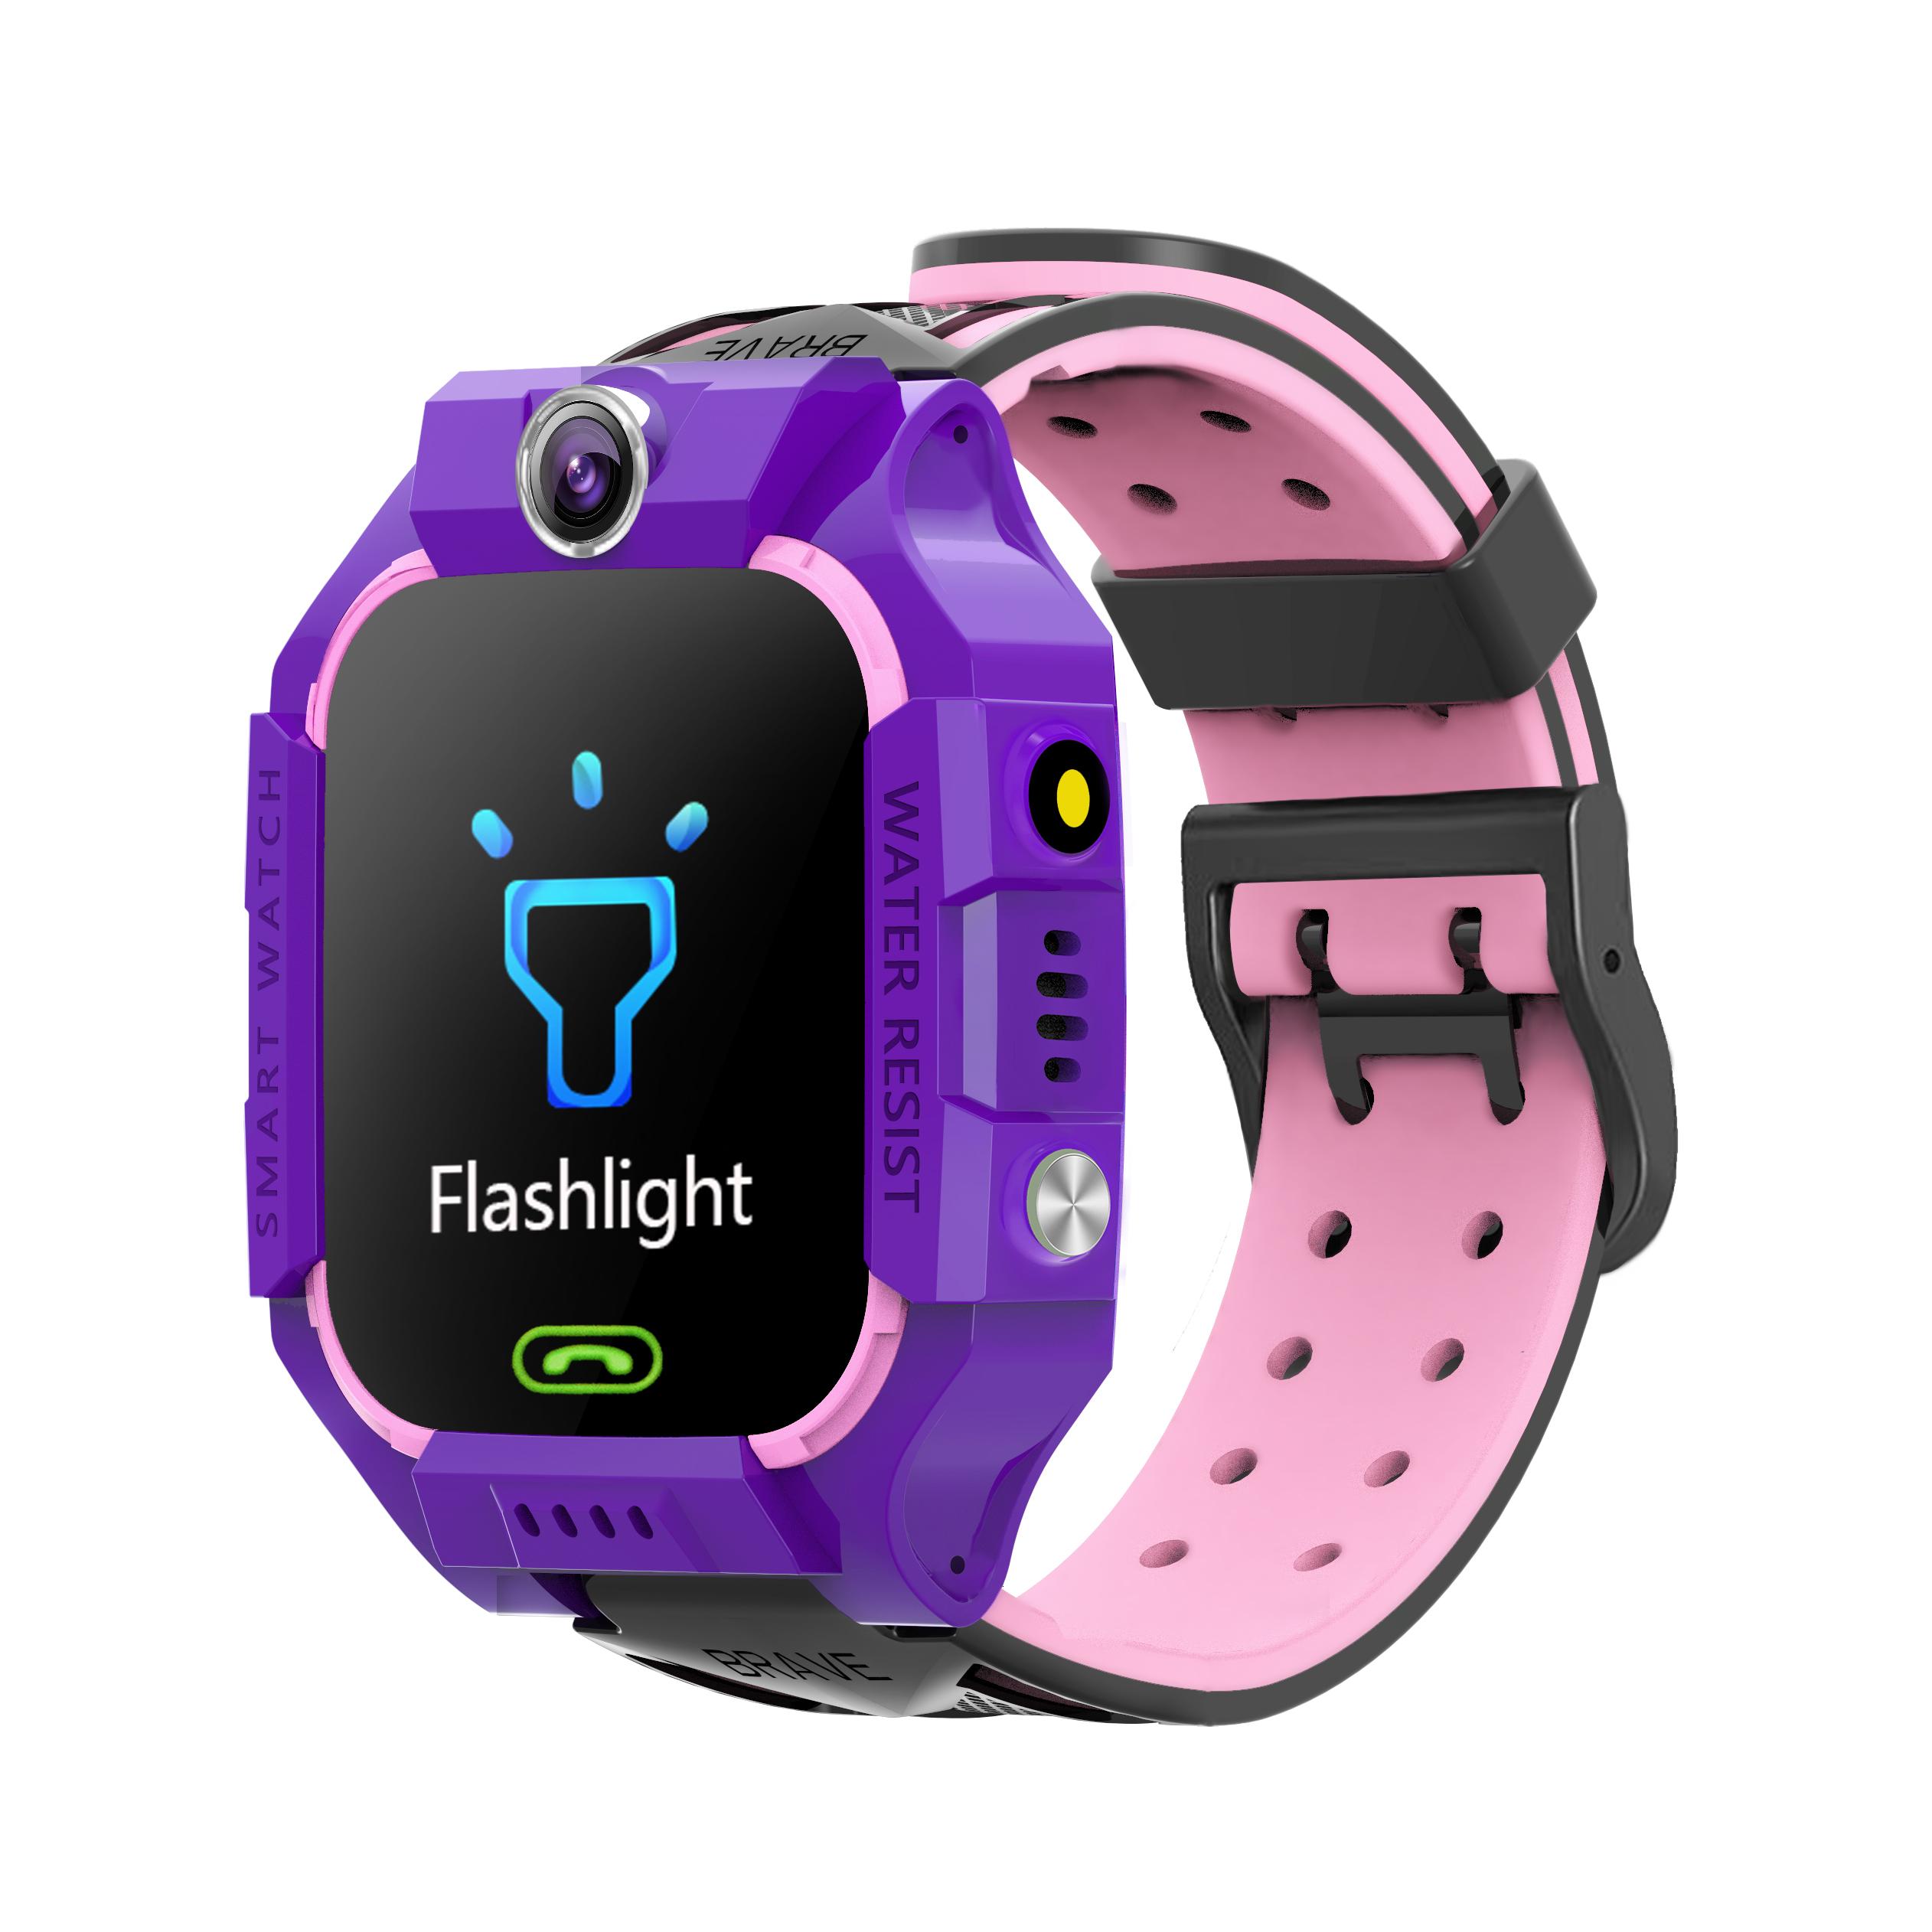 Z6 Children's Phone Watch GPS Flip rotation Location Kids Smartwatch Multifunctions Watch Pink